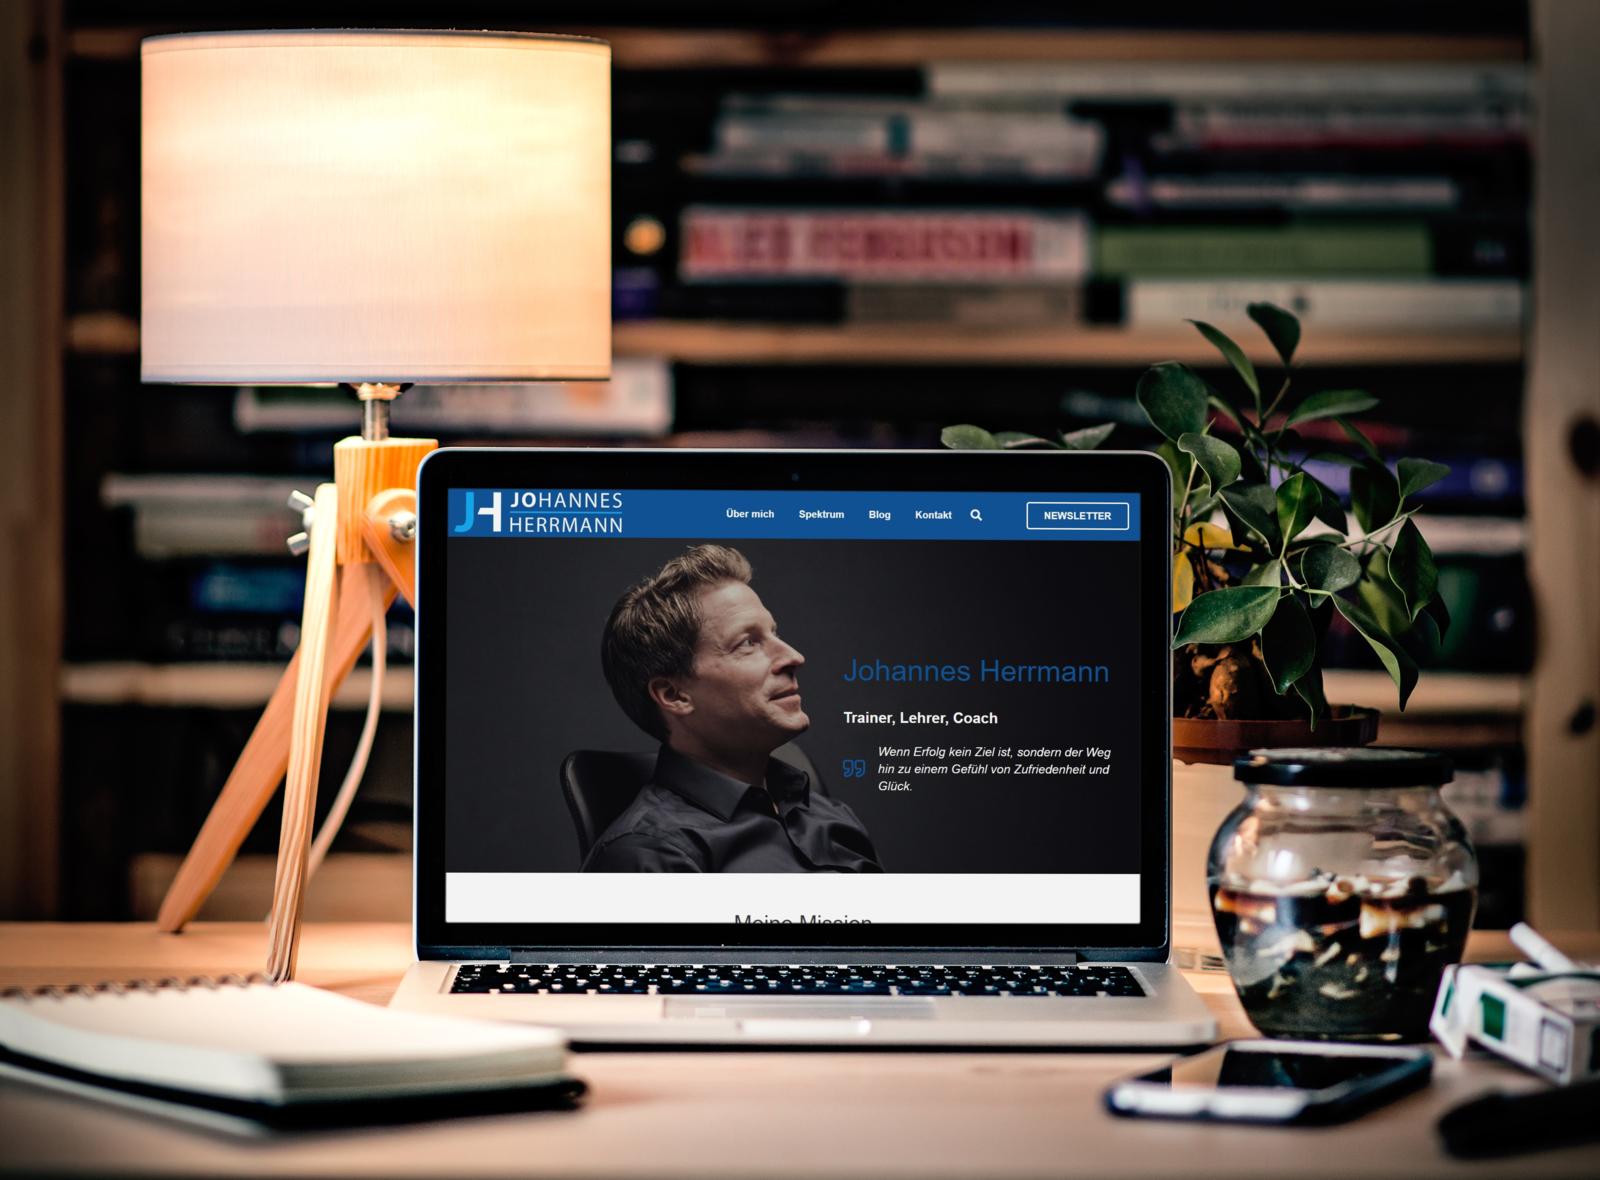 Johannes Hermann - Website Mockup